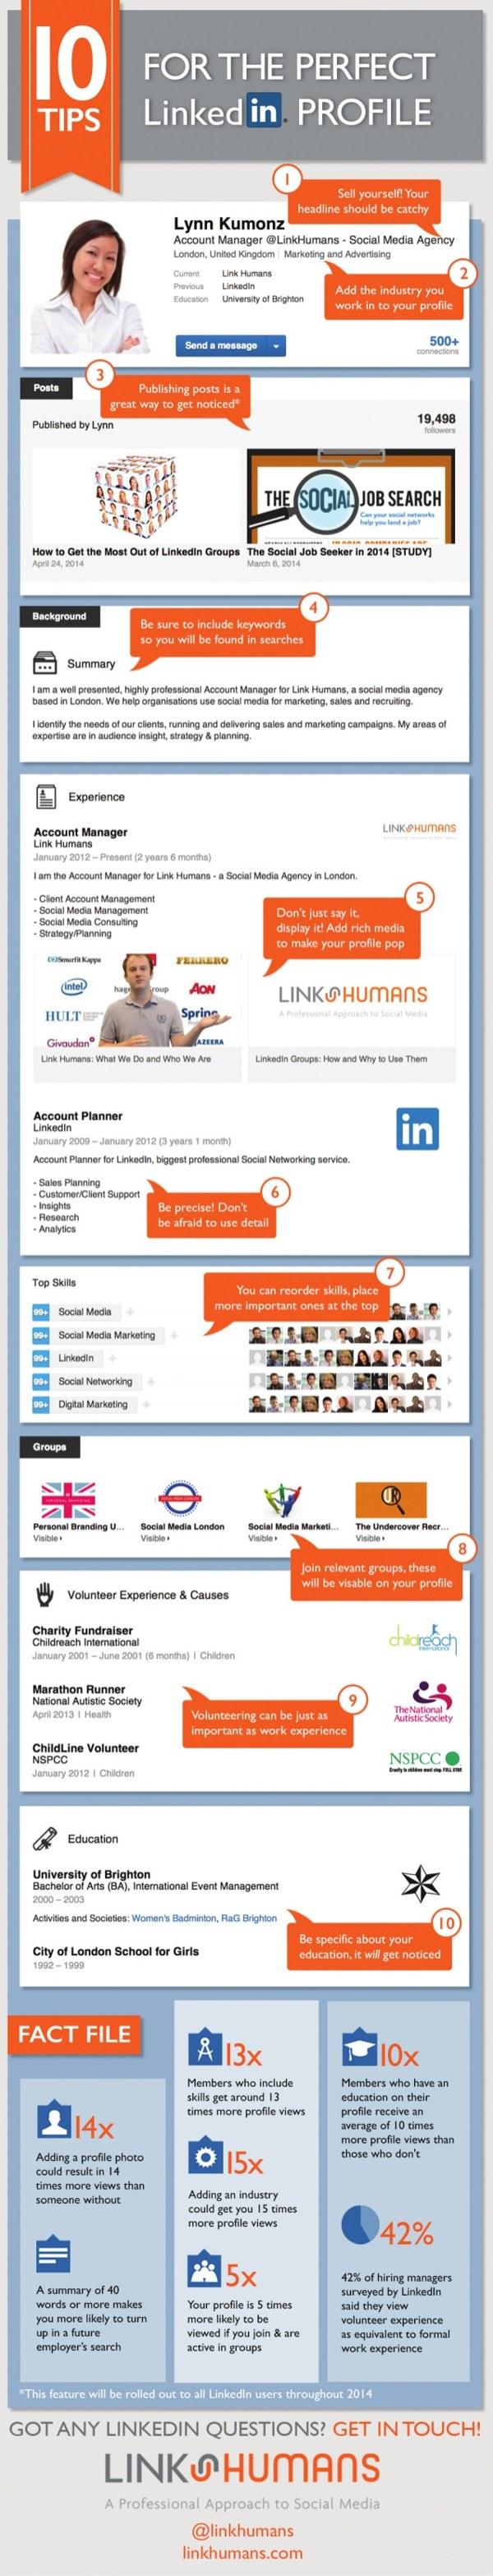 infografia consejos linkedin perfil